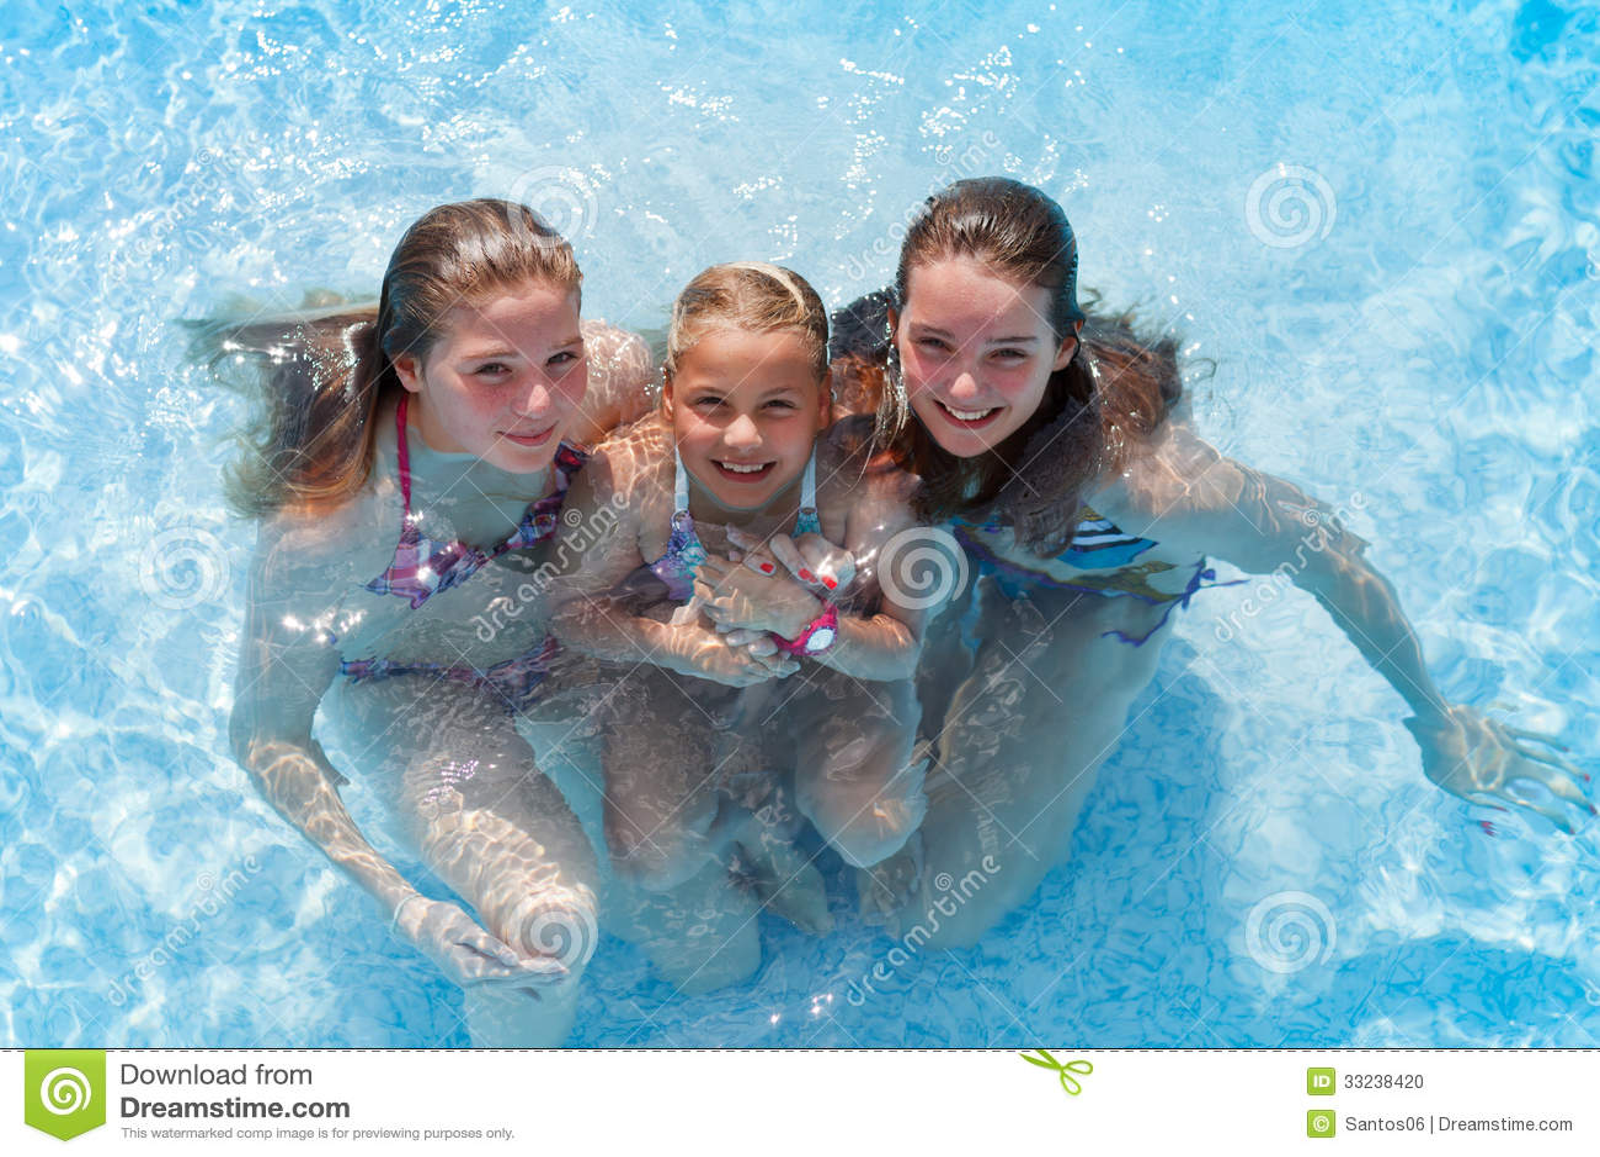 Три девки а бассейне фото 367-633